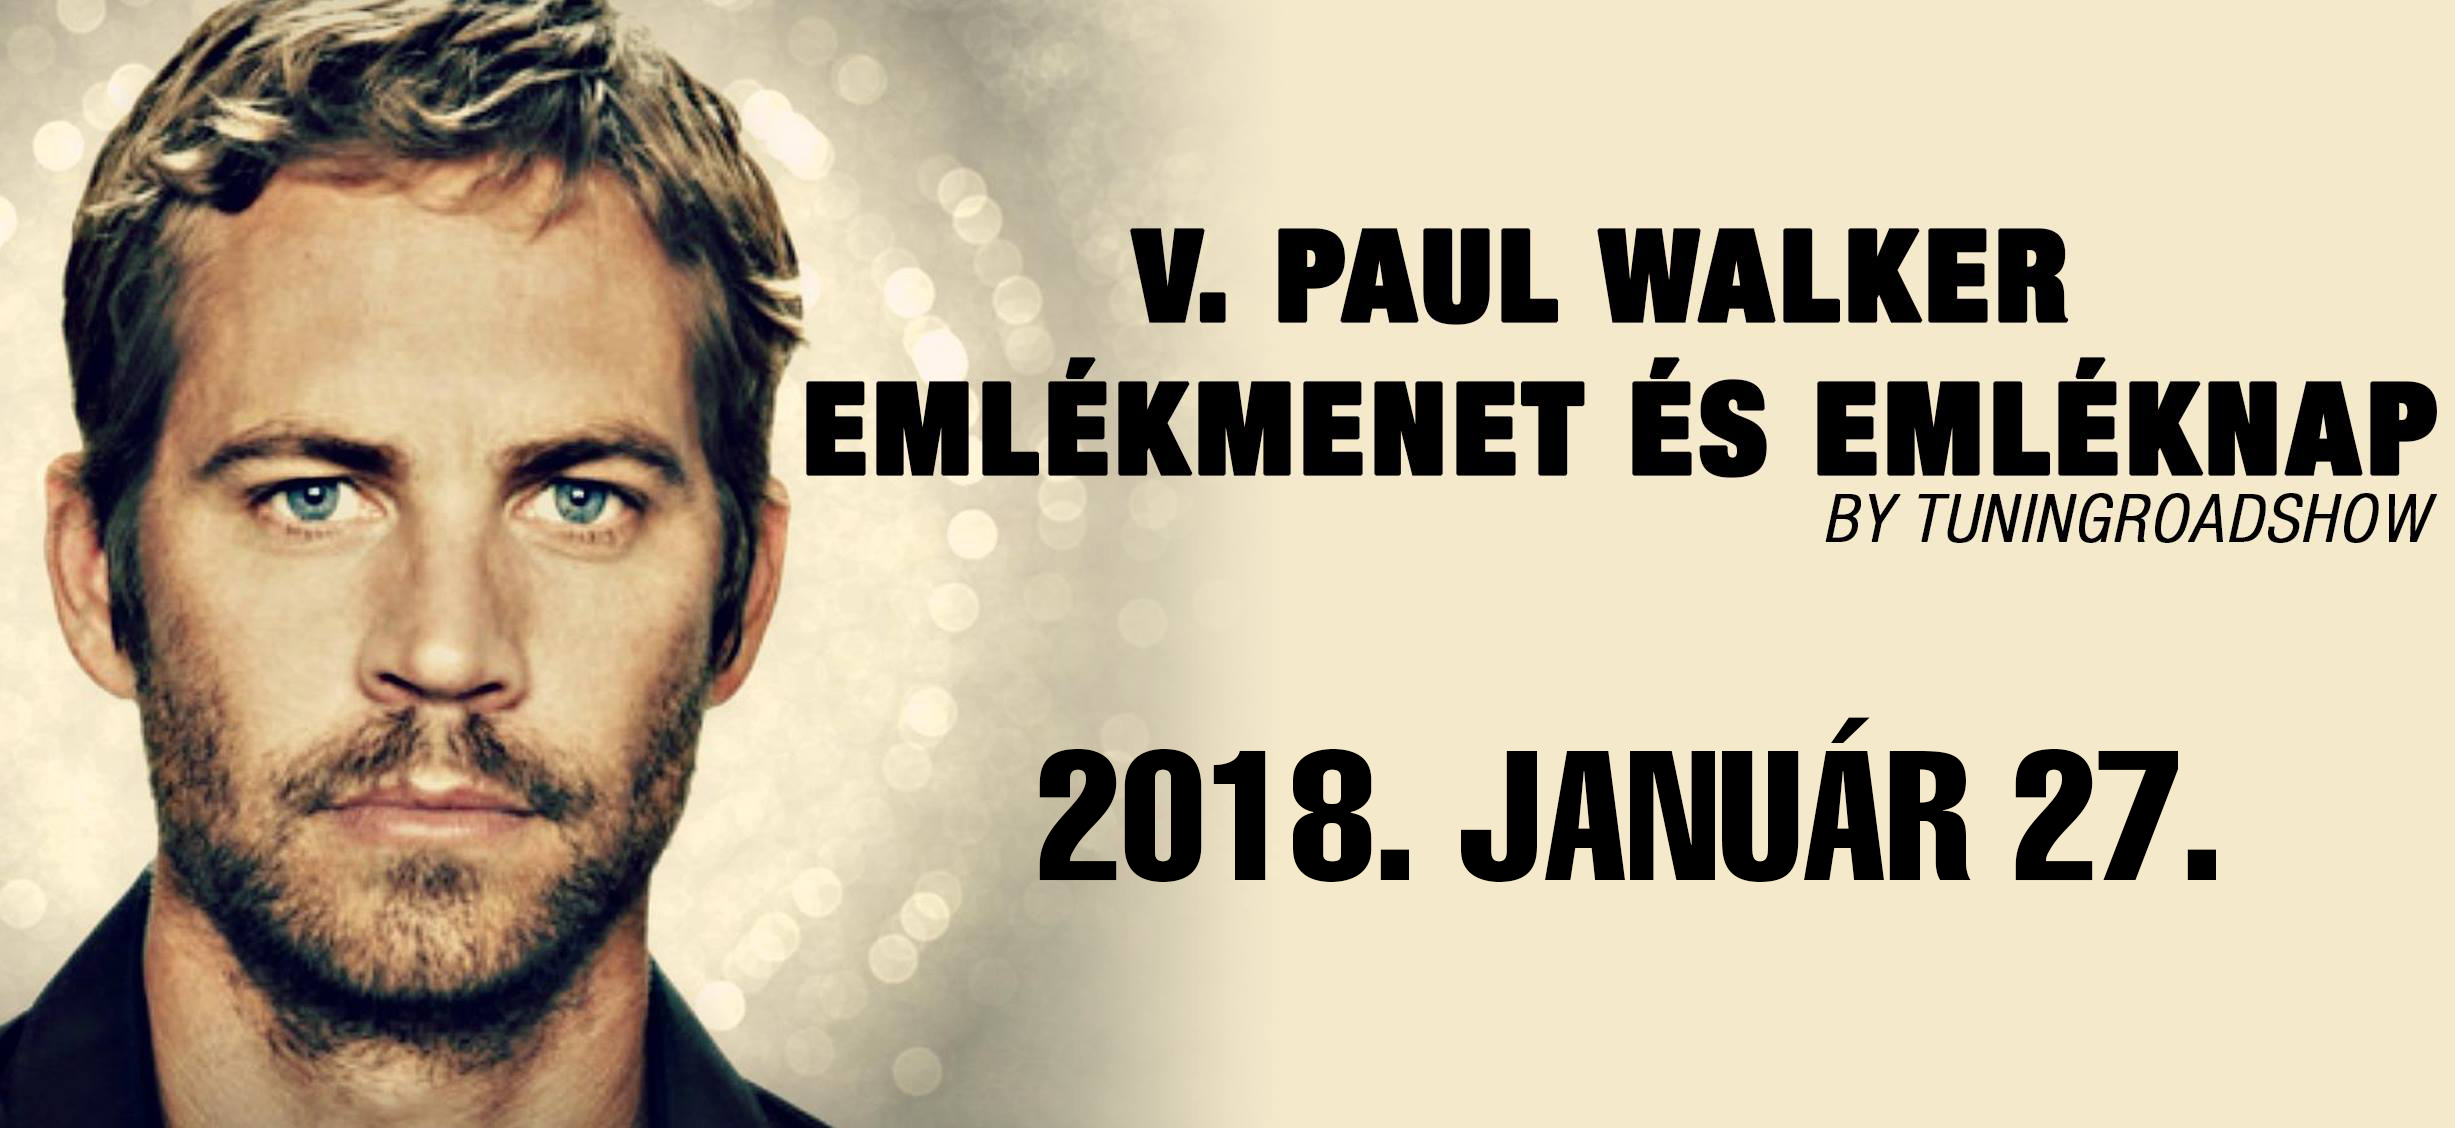 V. Paul Walker emlékmenet és emléknap